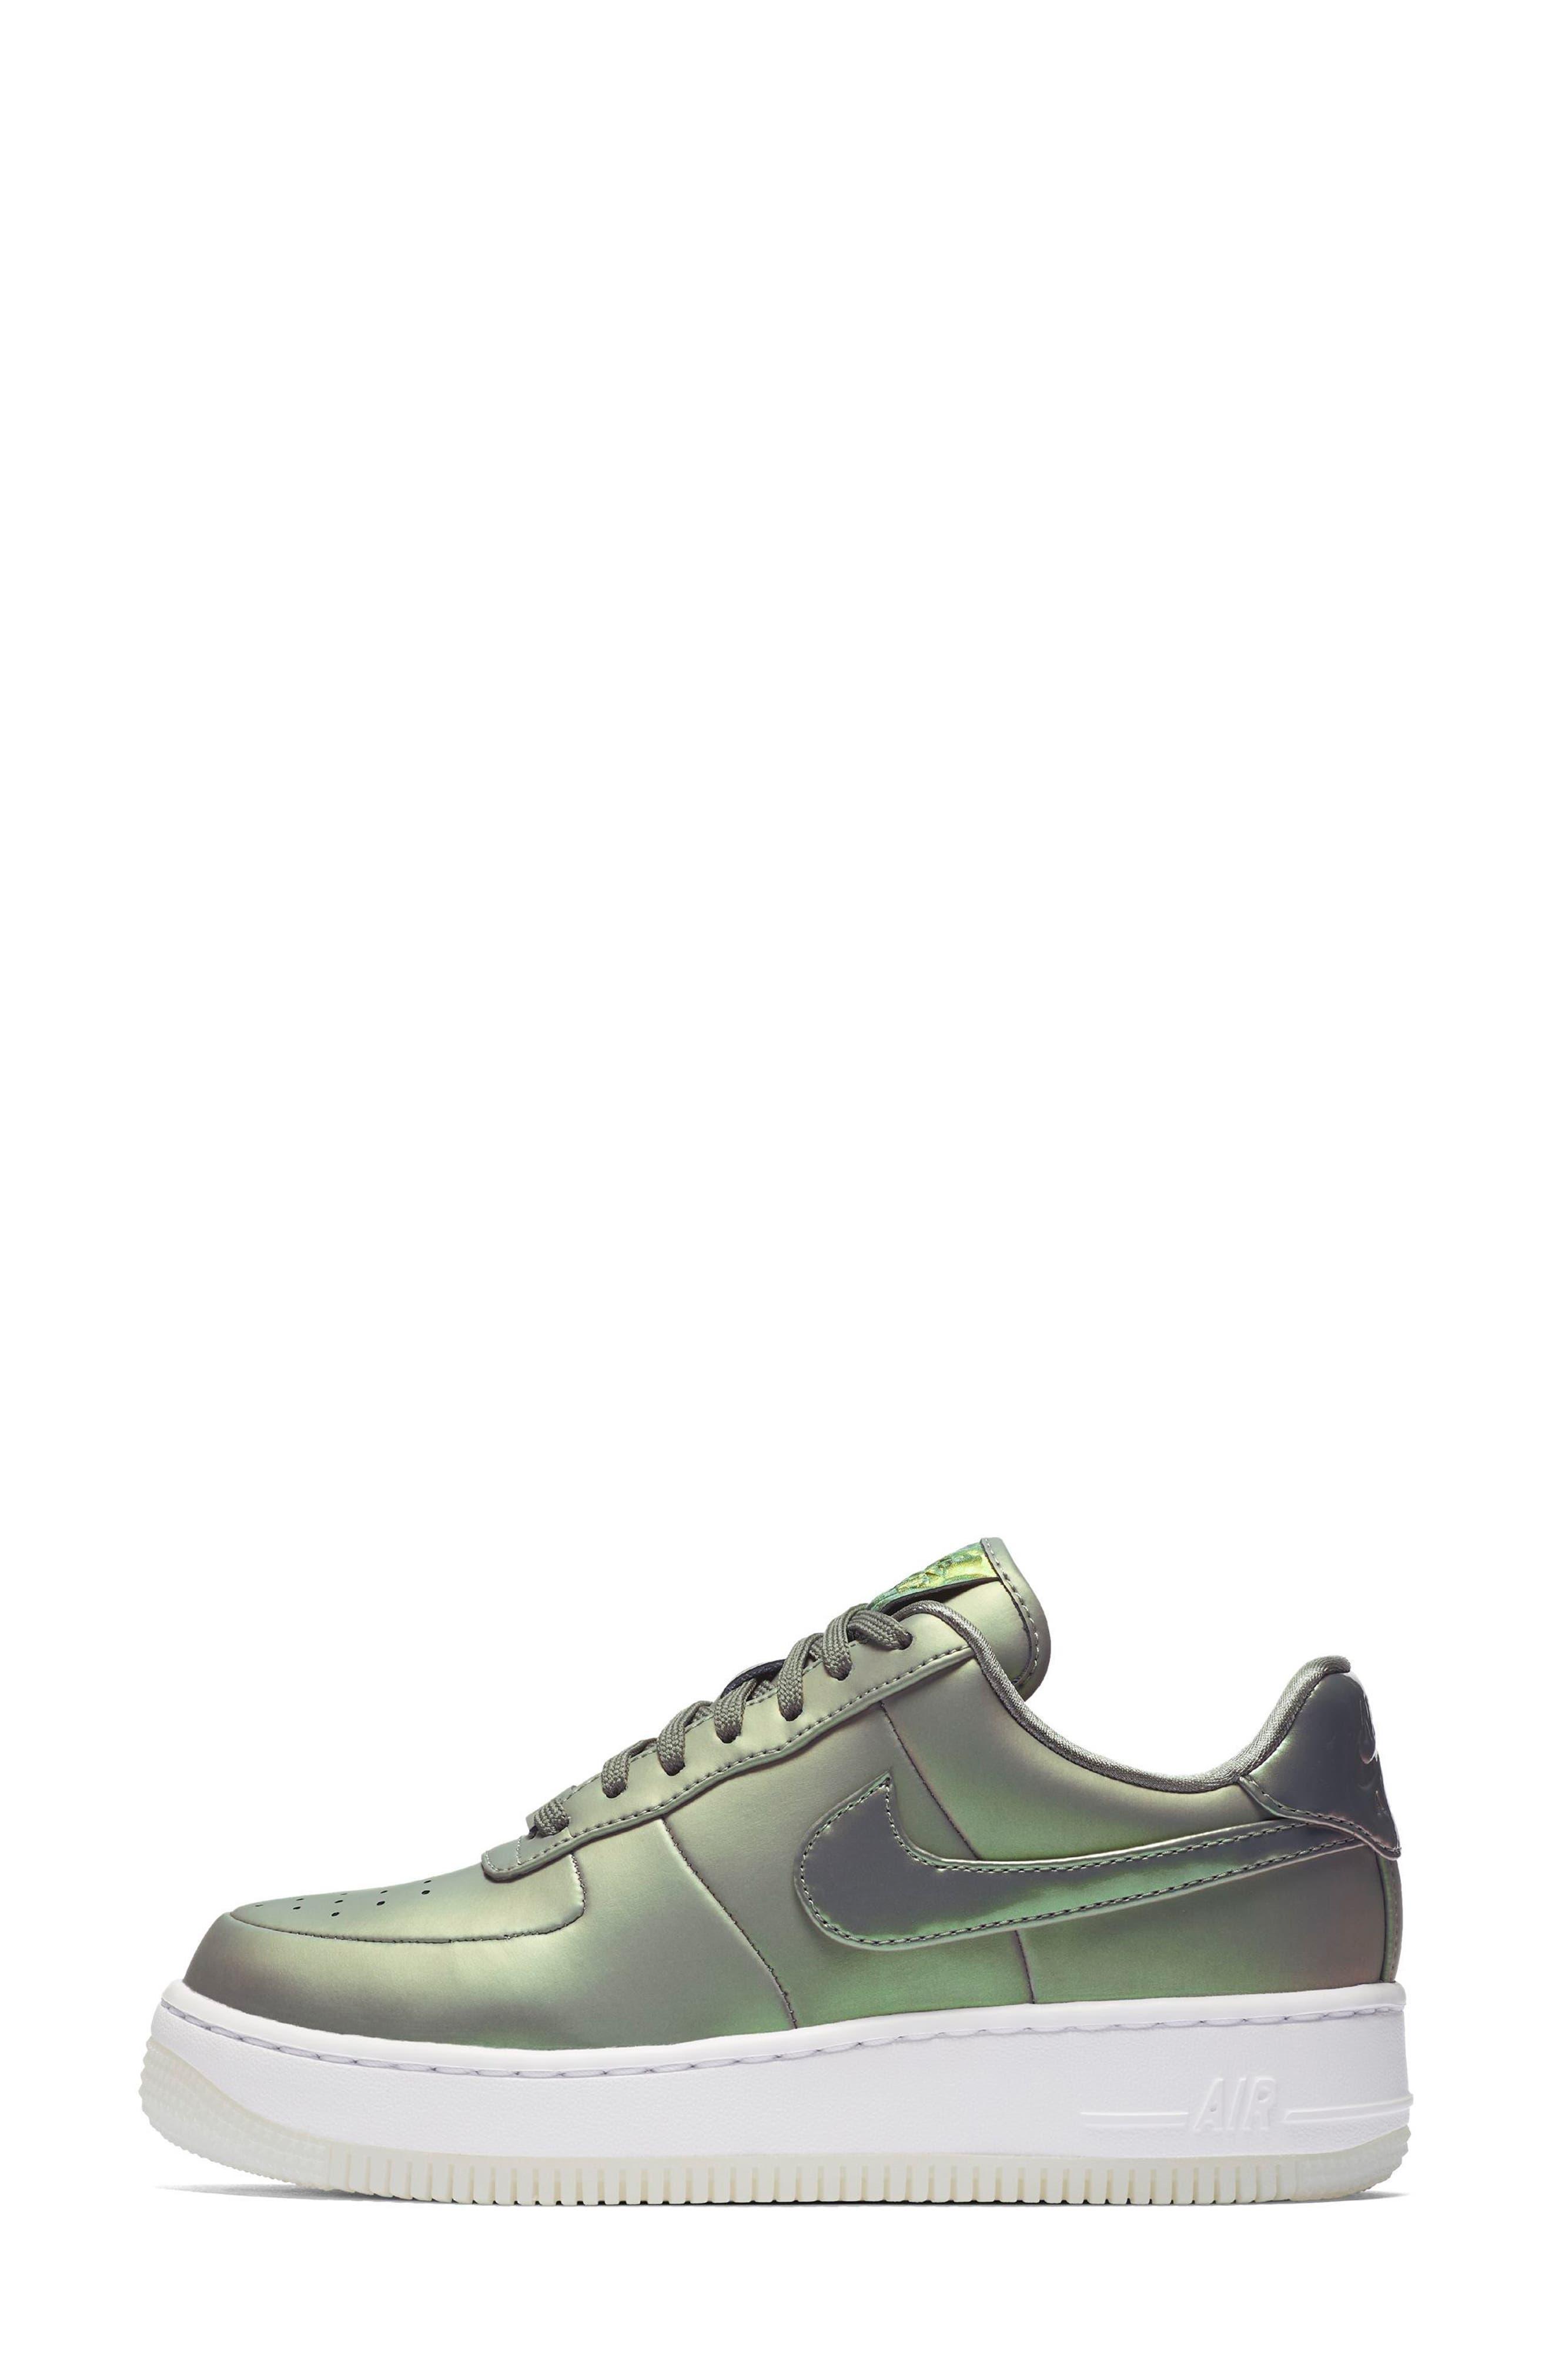 Air Force 1 Upstep Premium LX Shoe,                             Alternate thumbnail 3, color,                             Dark Stucco/ Stucco/ White